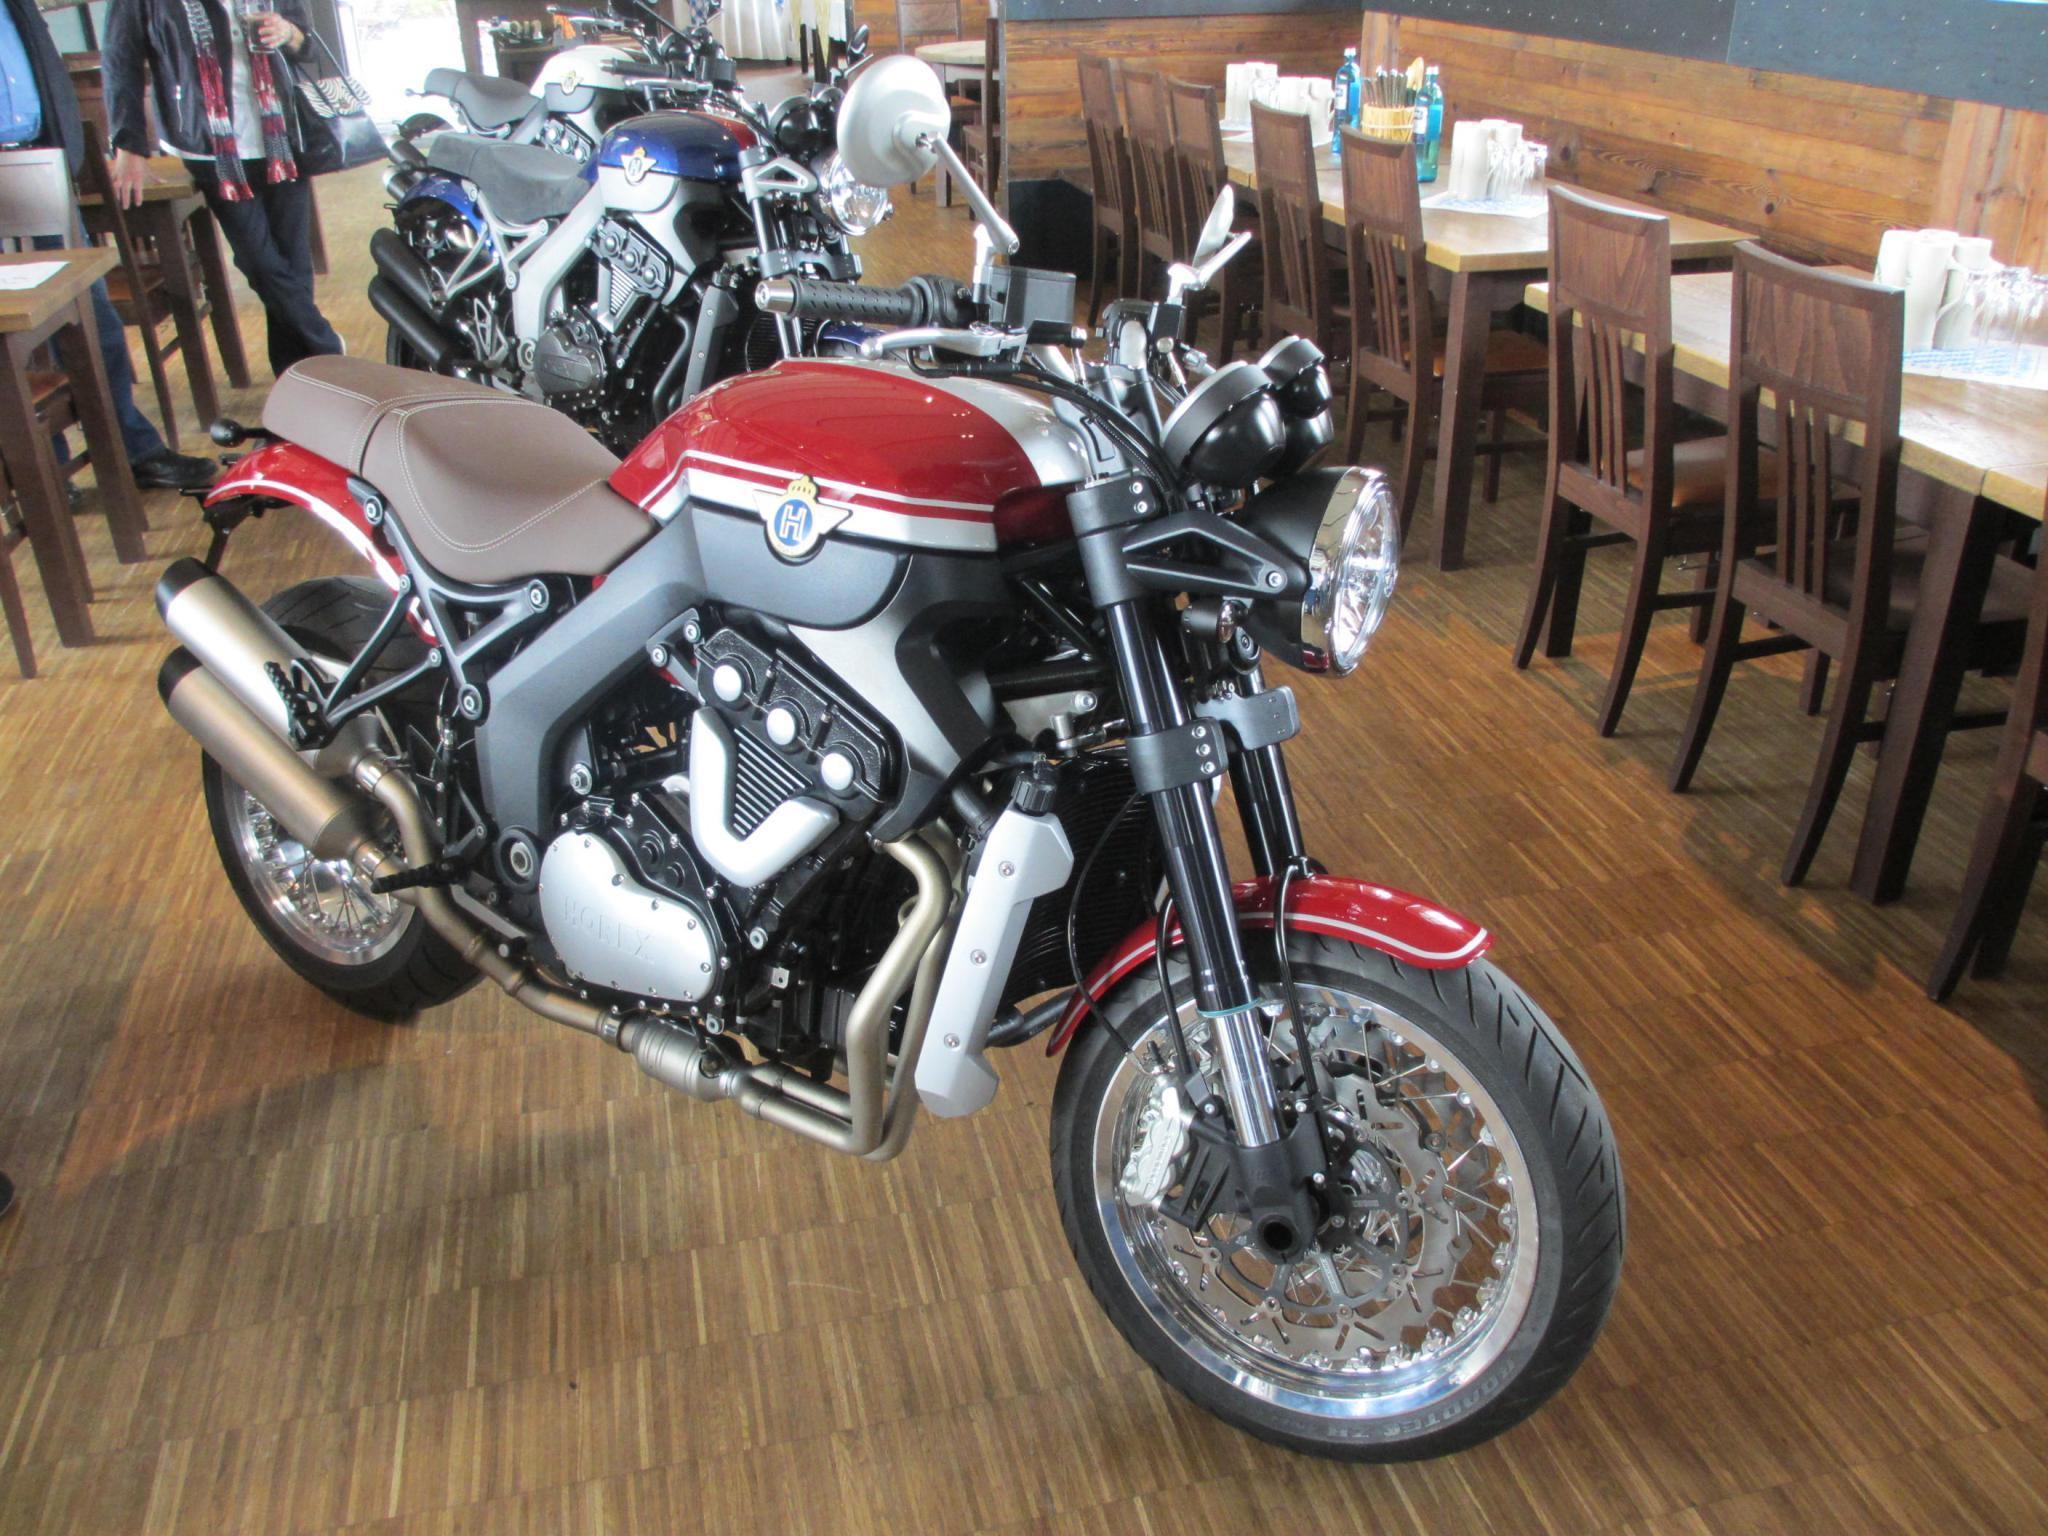 Horex Meeting Mit Horst Lichter 25 06 2013 Motorrad Fotos